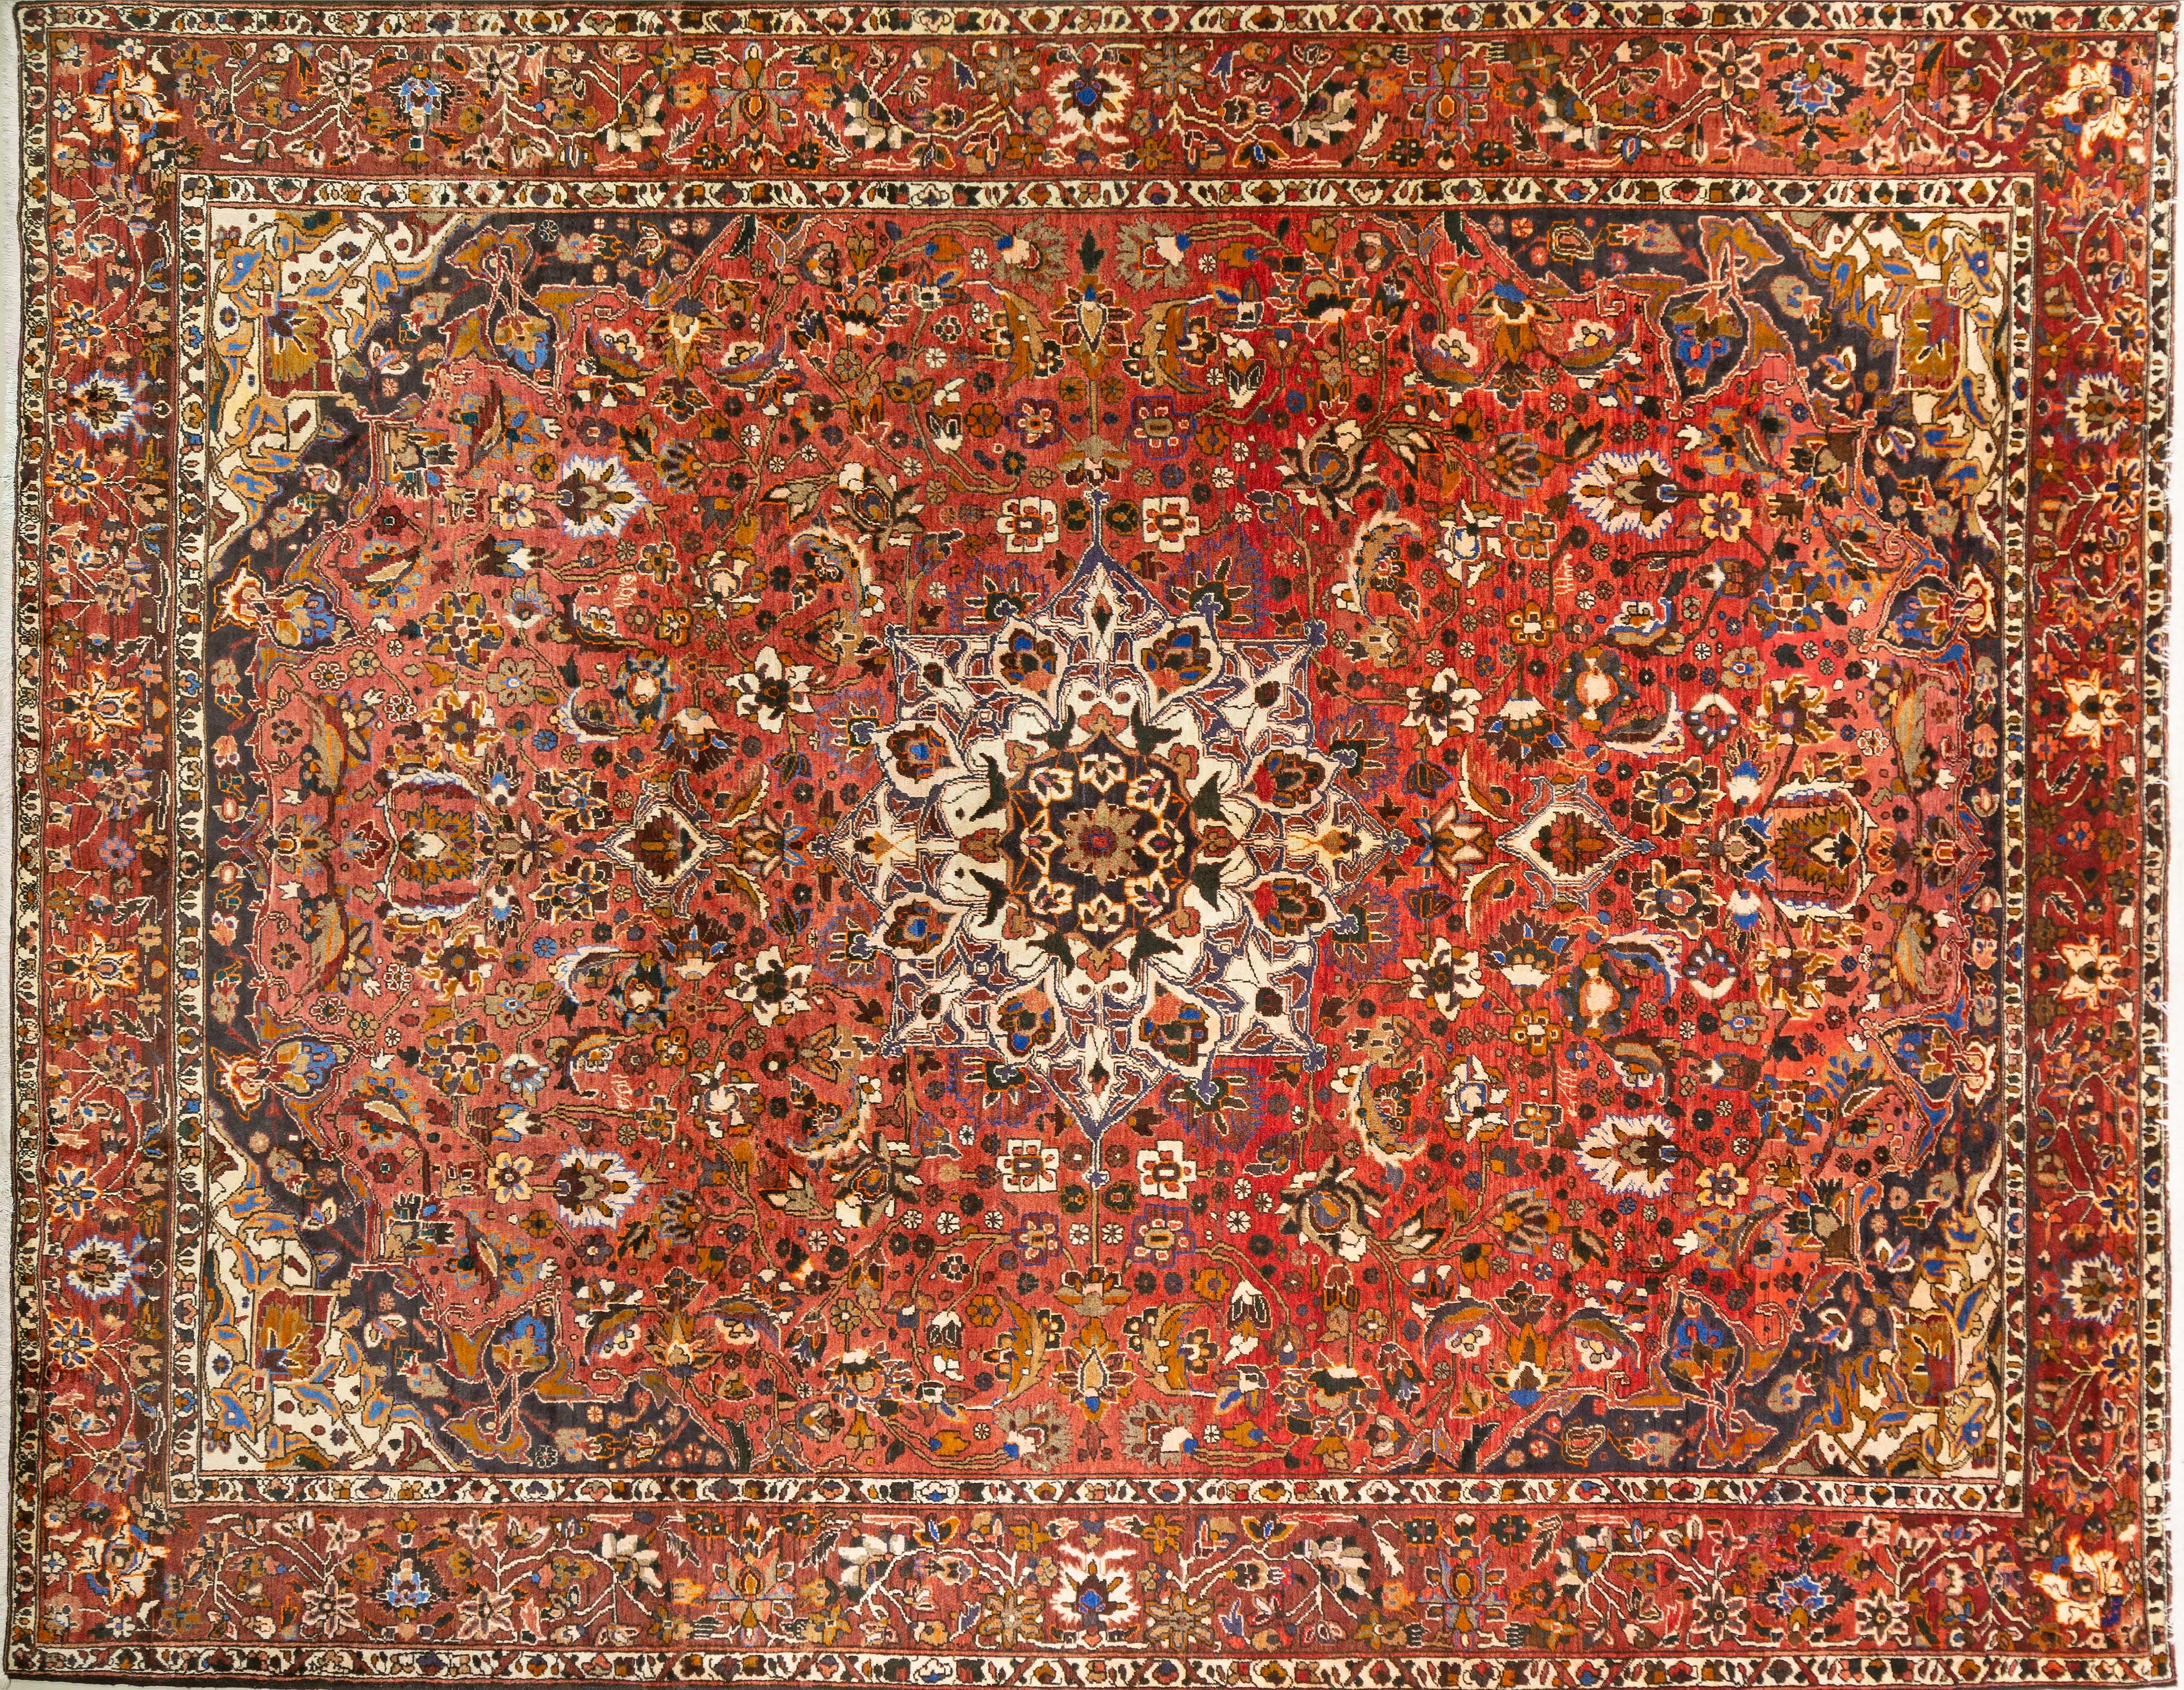 A Persian Hand Knotted Bakhtiari Carpet, 355 x 280